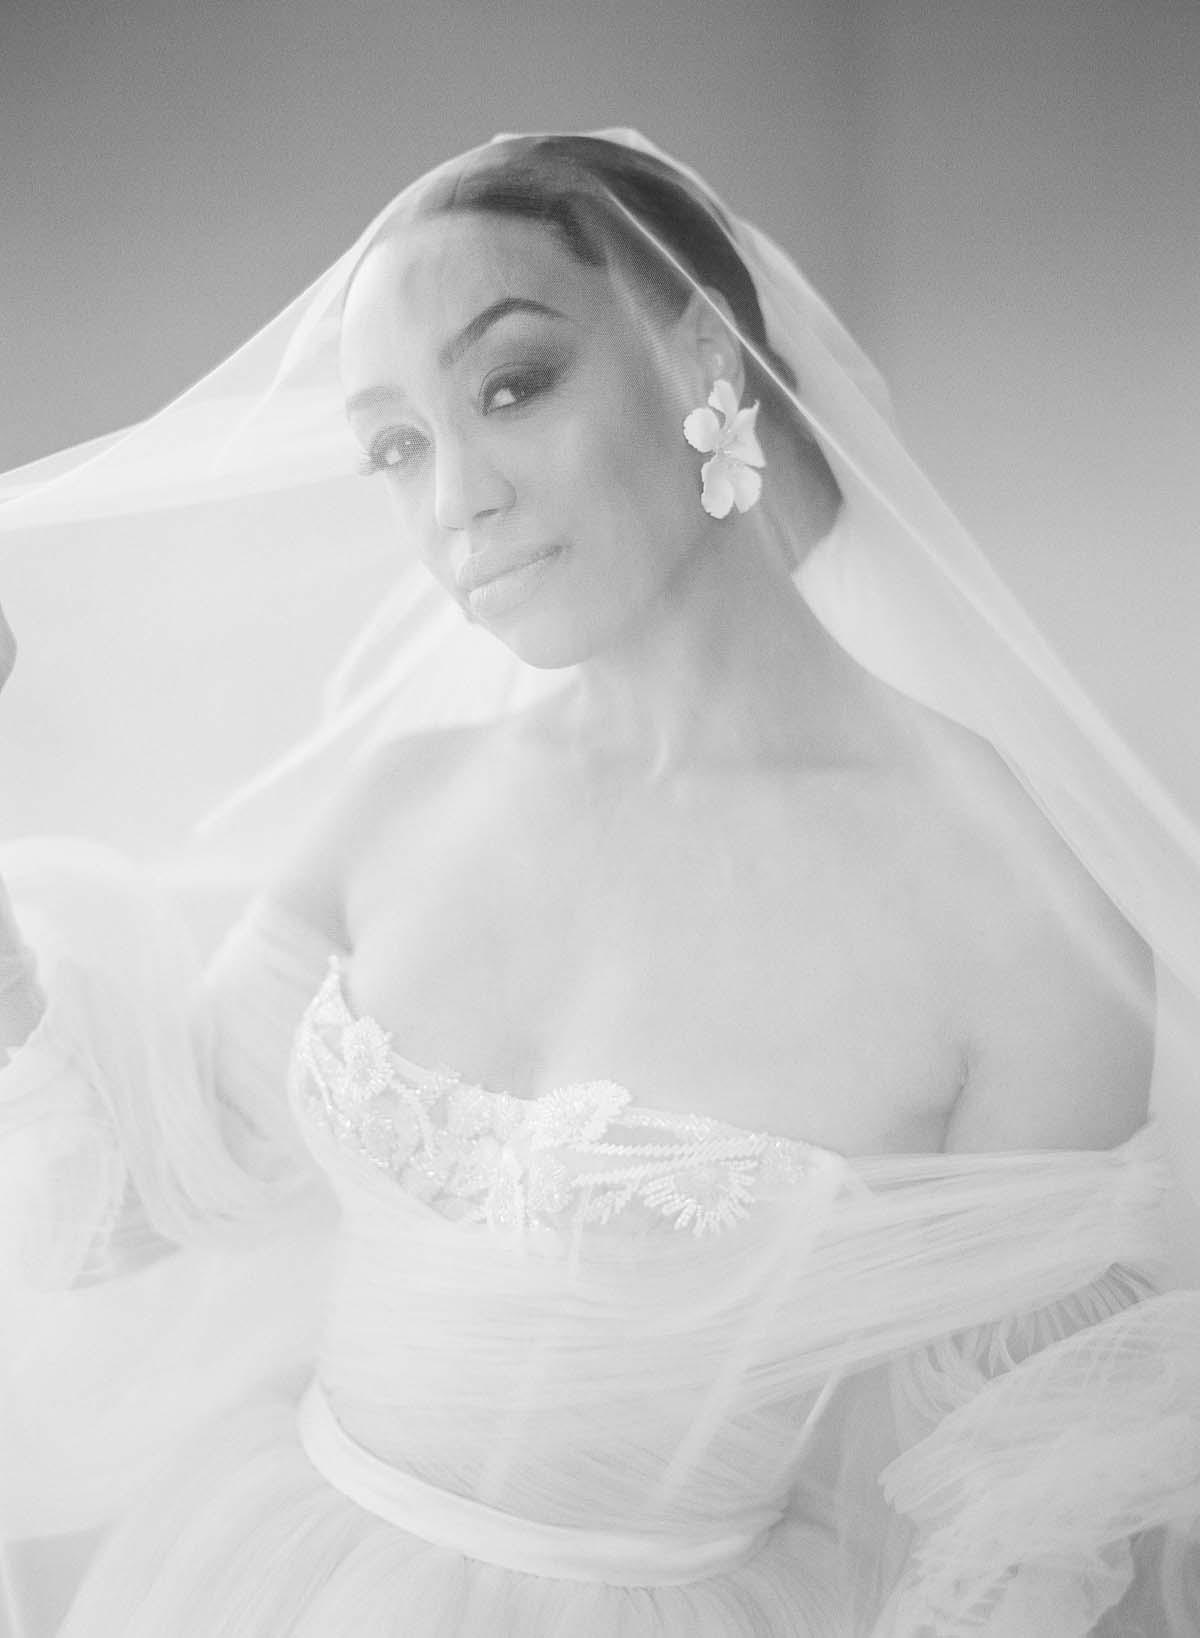 XOXO_BRIDE_Events-Michelle-Beller_Photography_0135